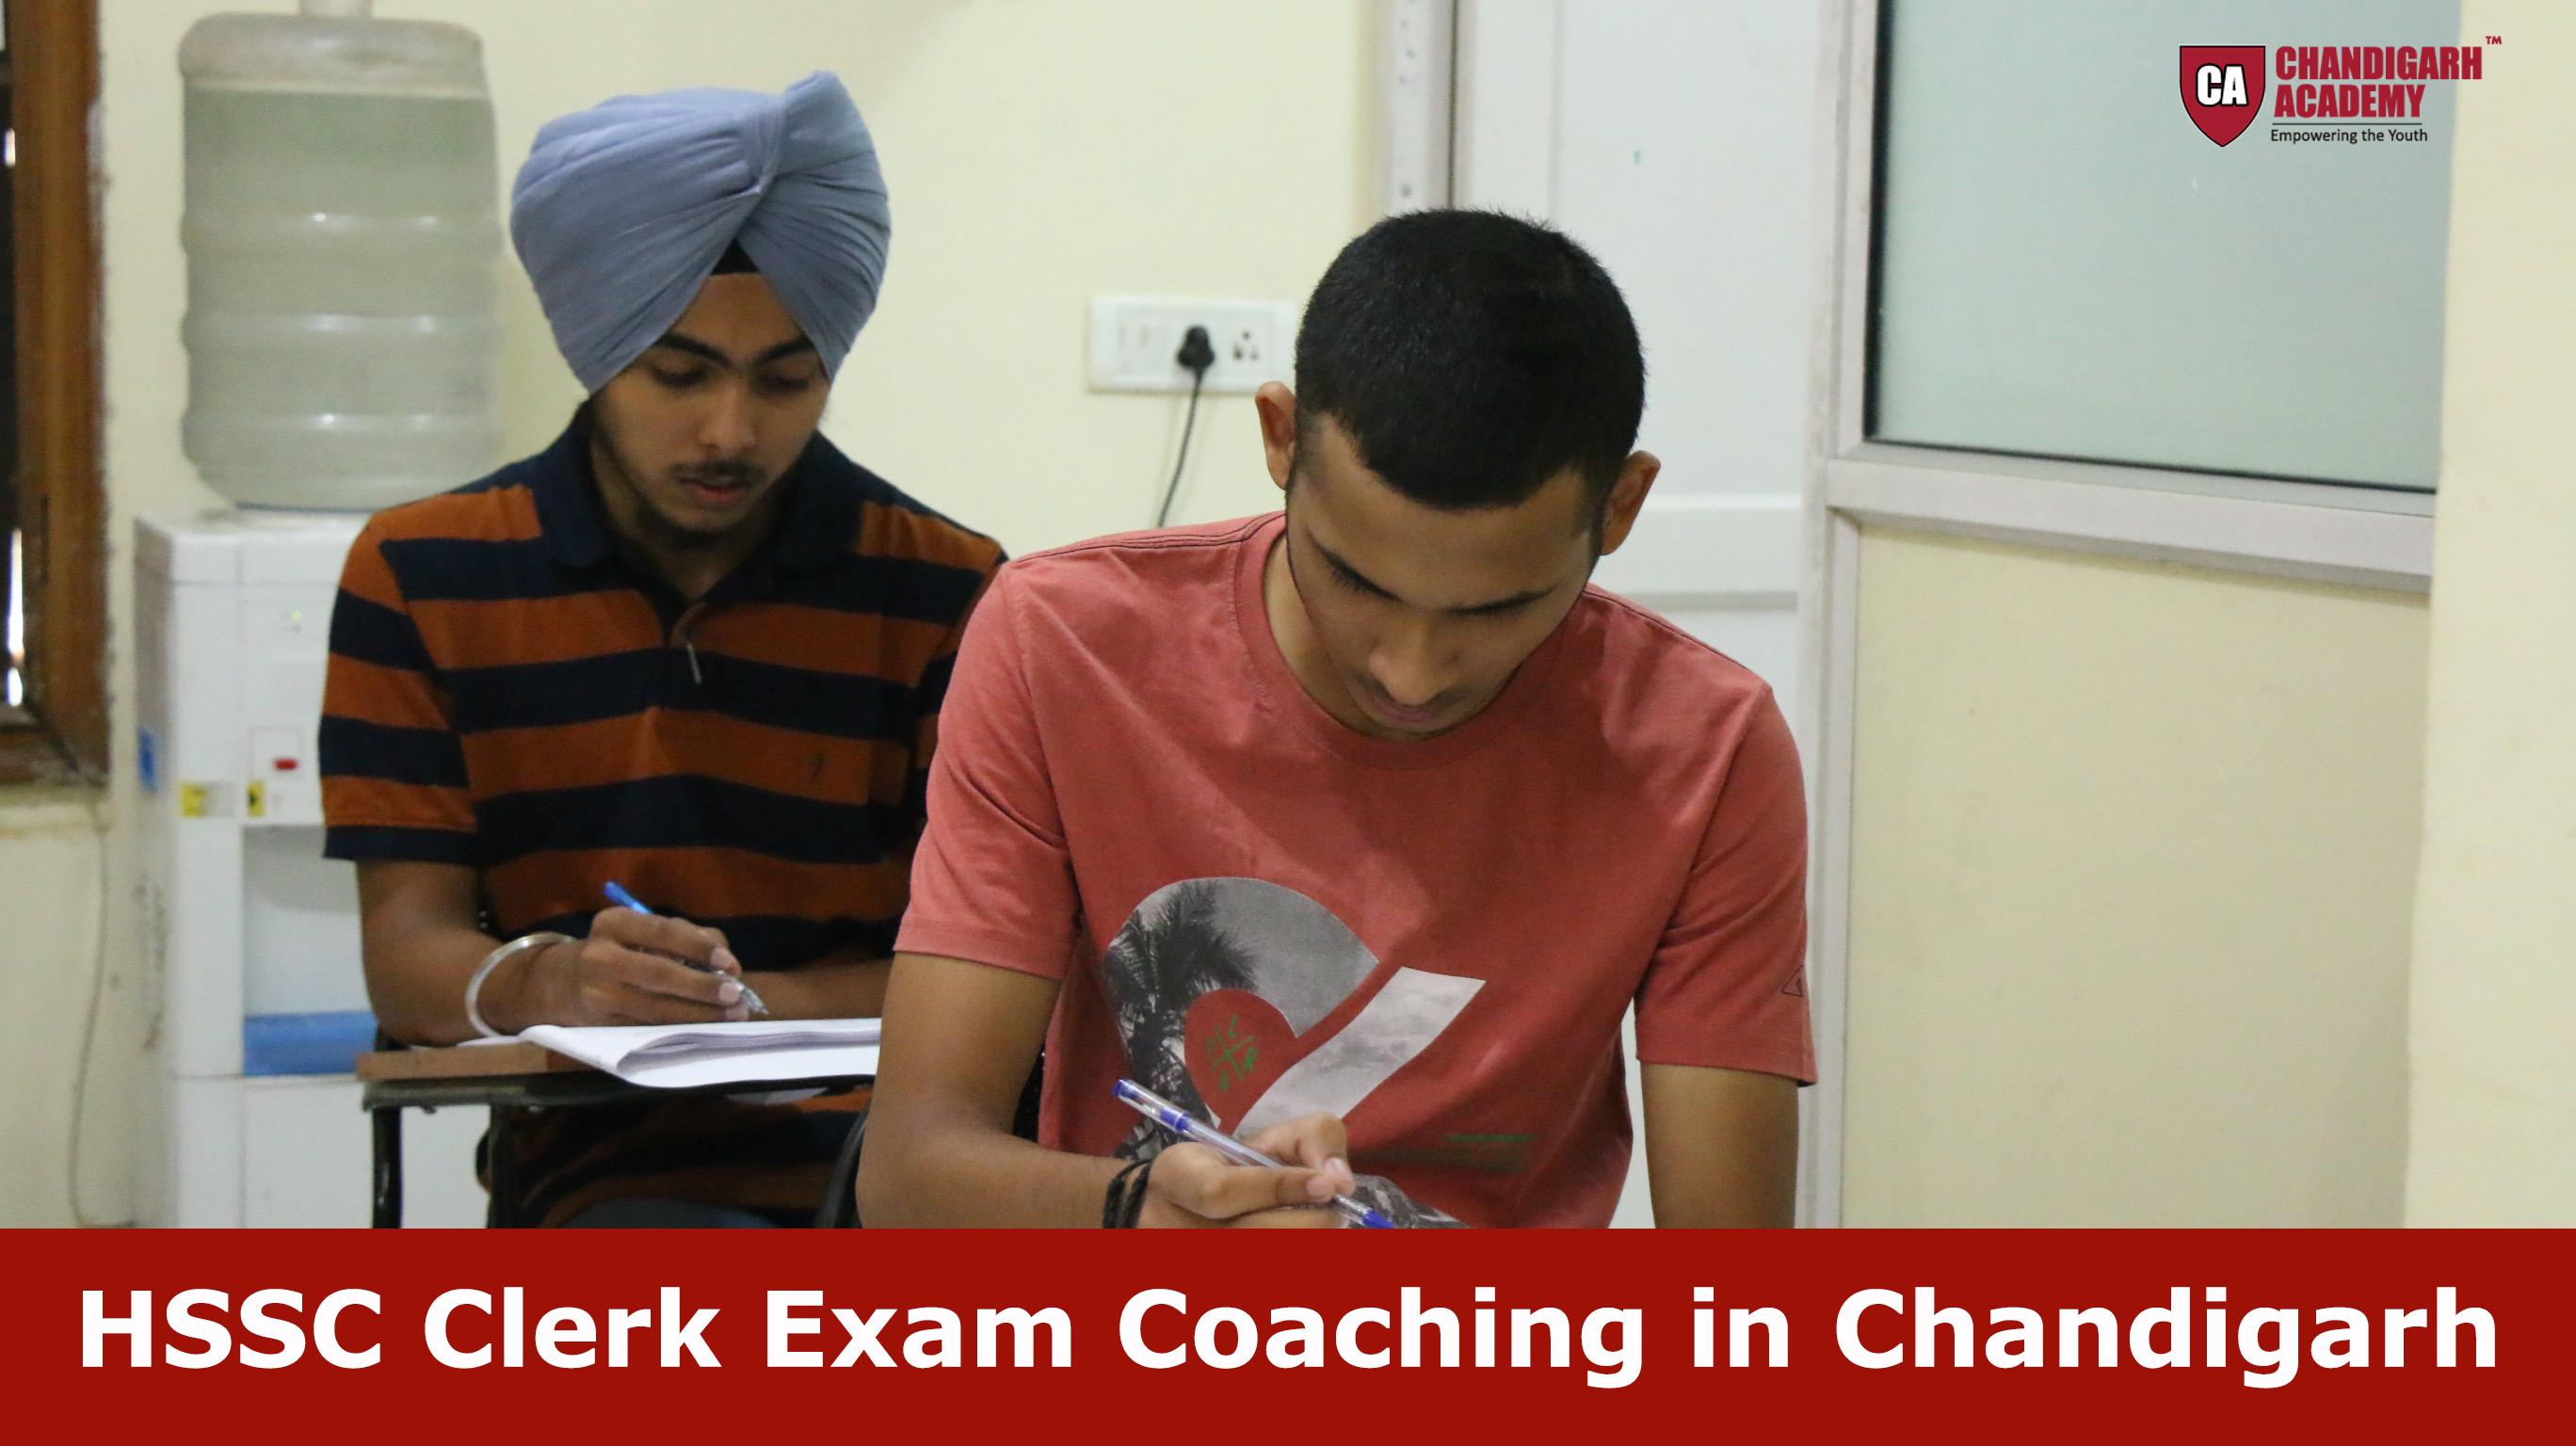 HSSC Clerk Exam Coaching in Chandigarh